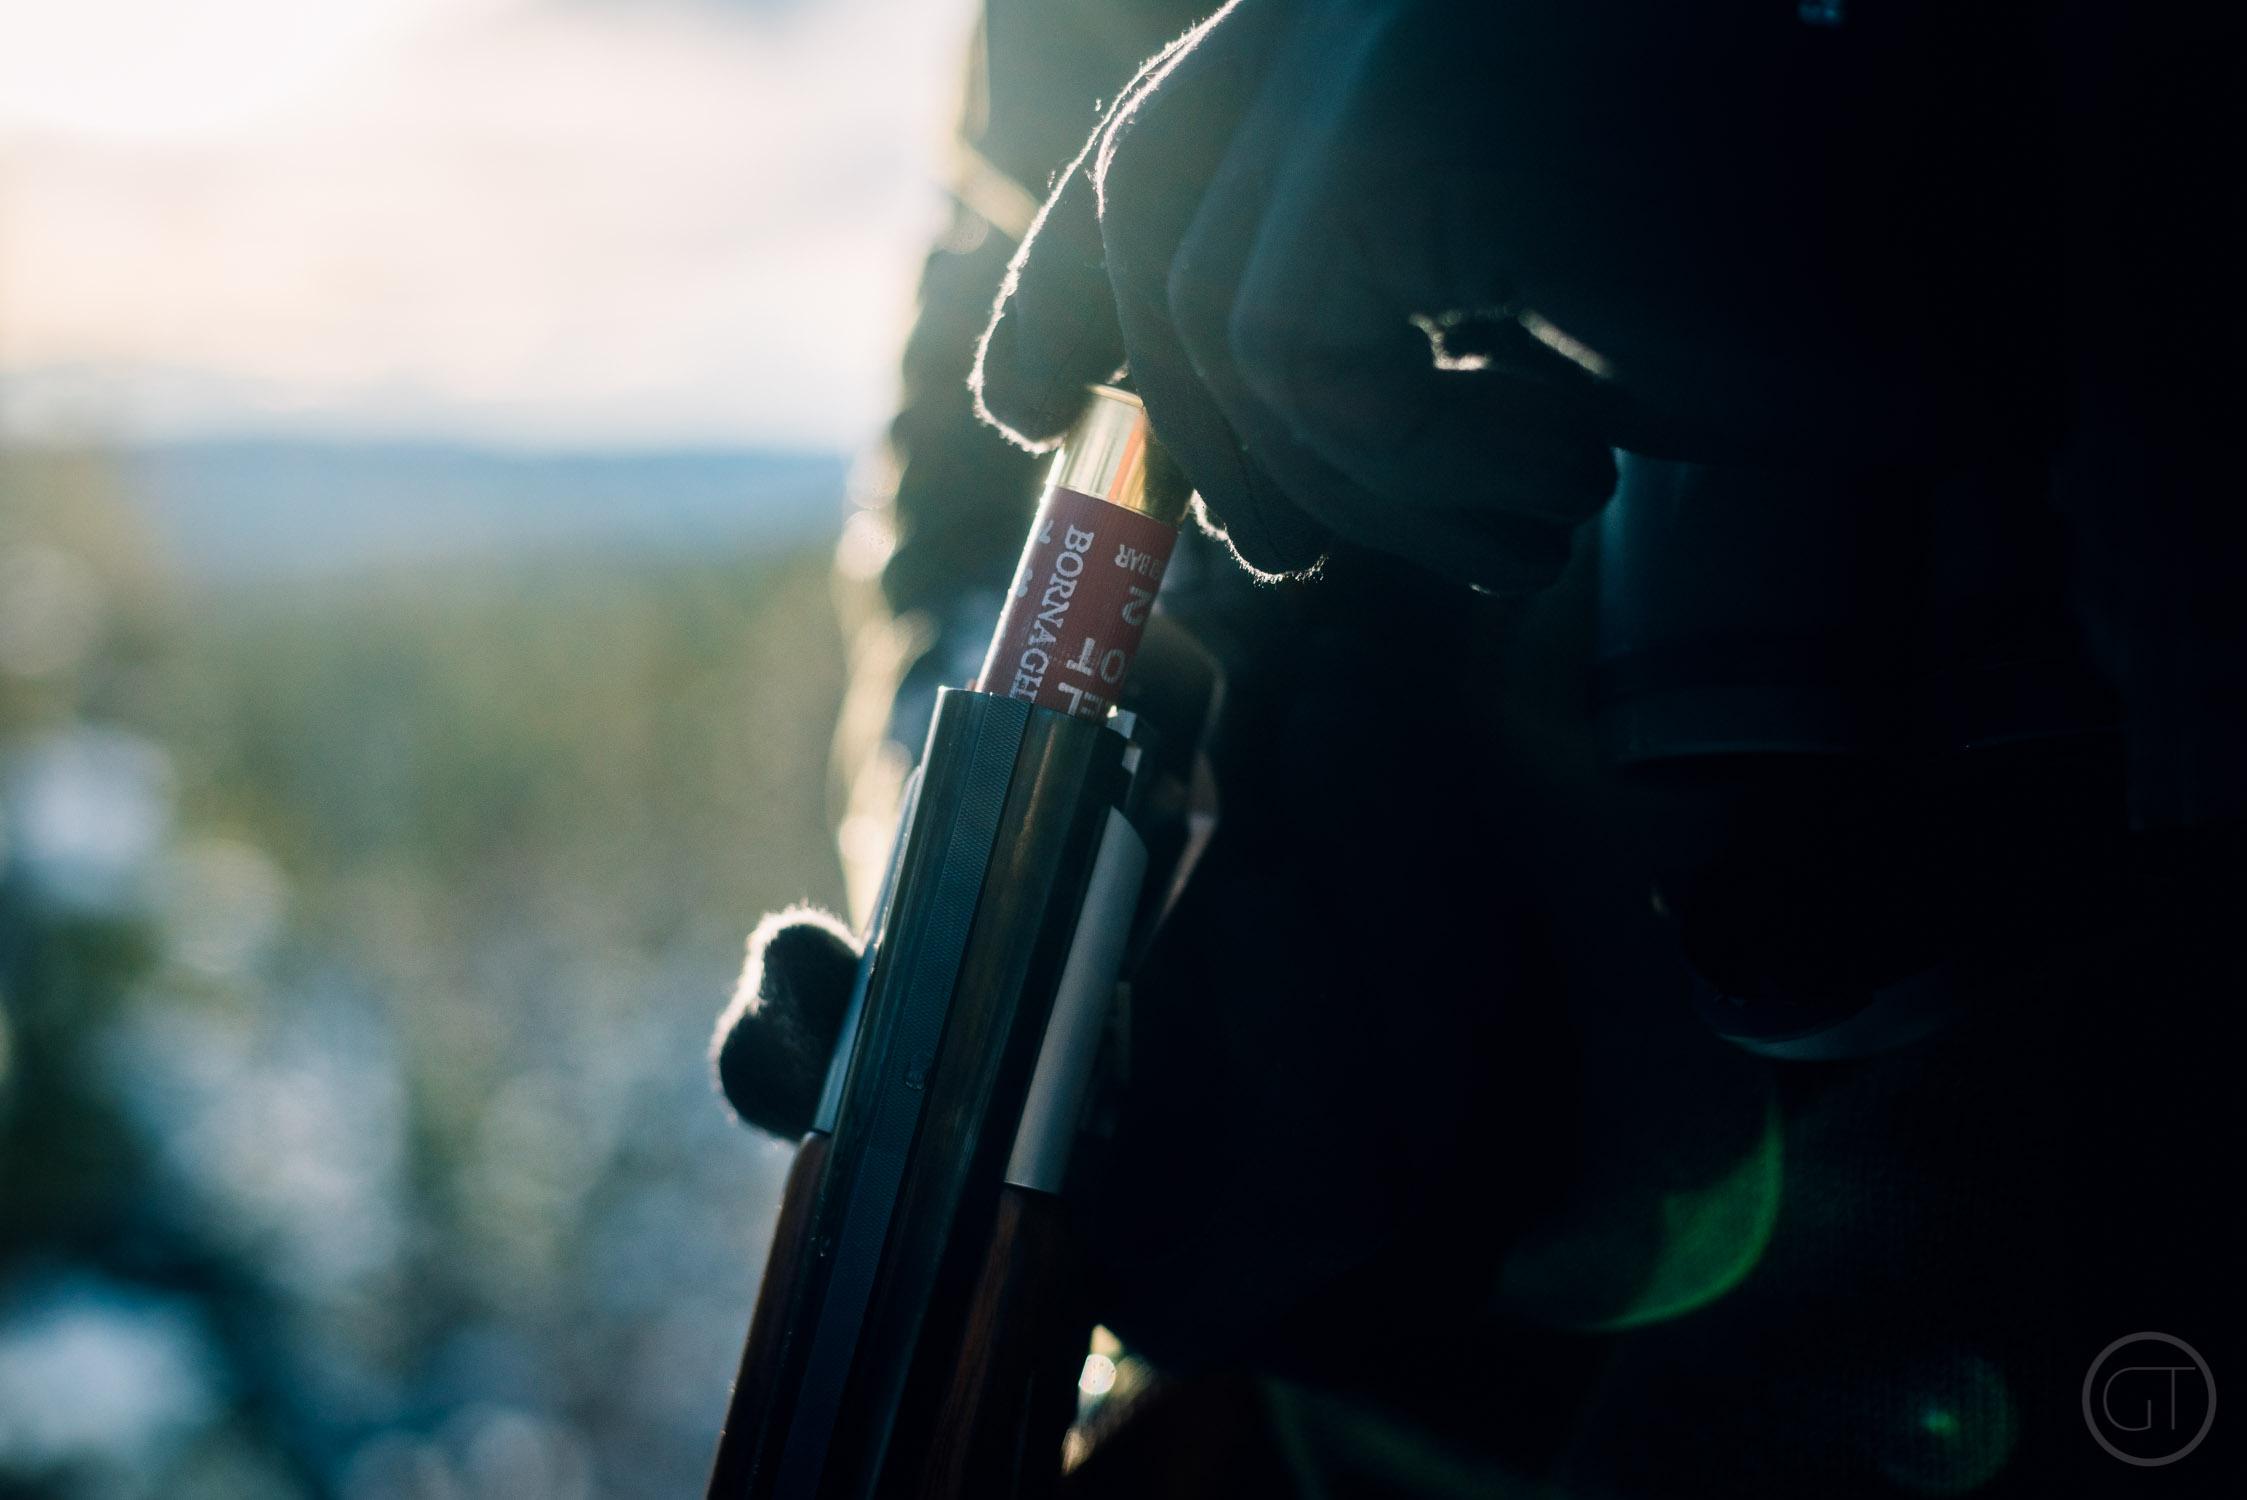 GUSTAV_THUESEN_HUNTING_NORWAY_OUTDOOR_LIFESTYLE_PHOTOGRAPHER_PROFESSIONAL-15.jpg